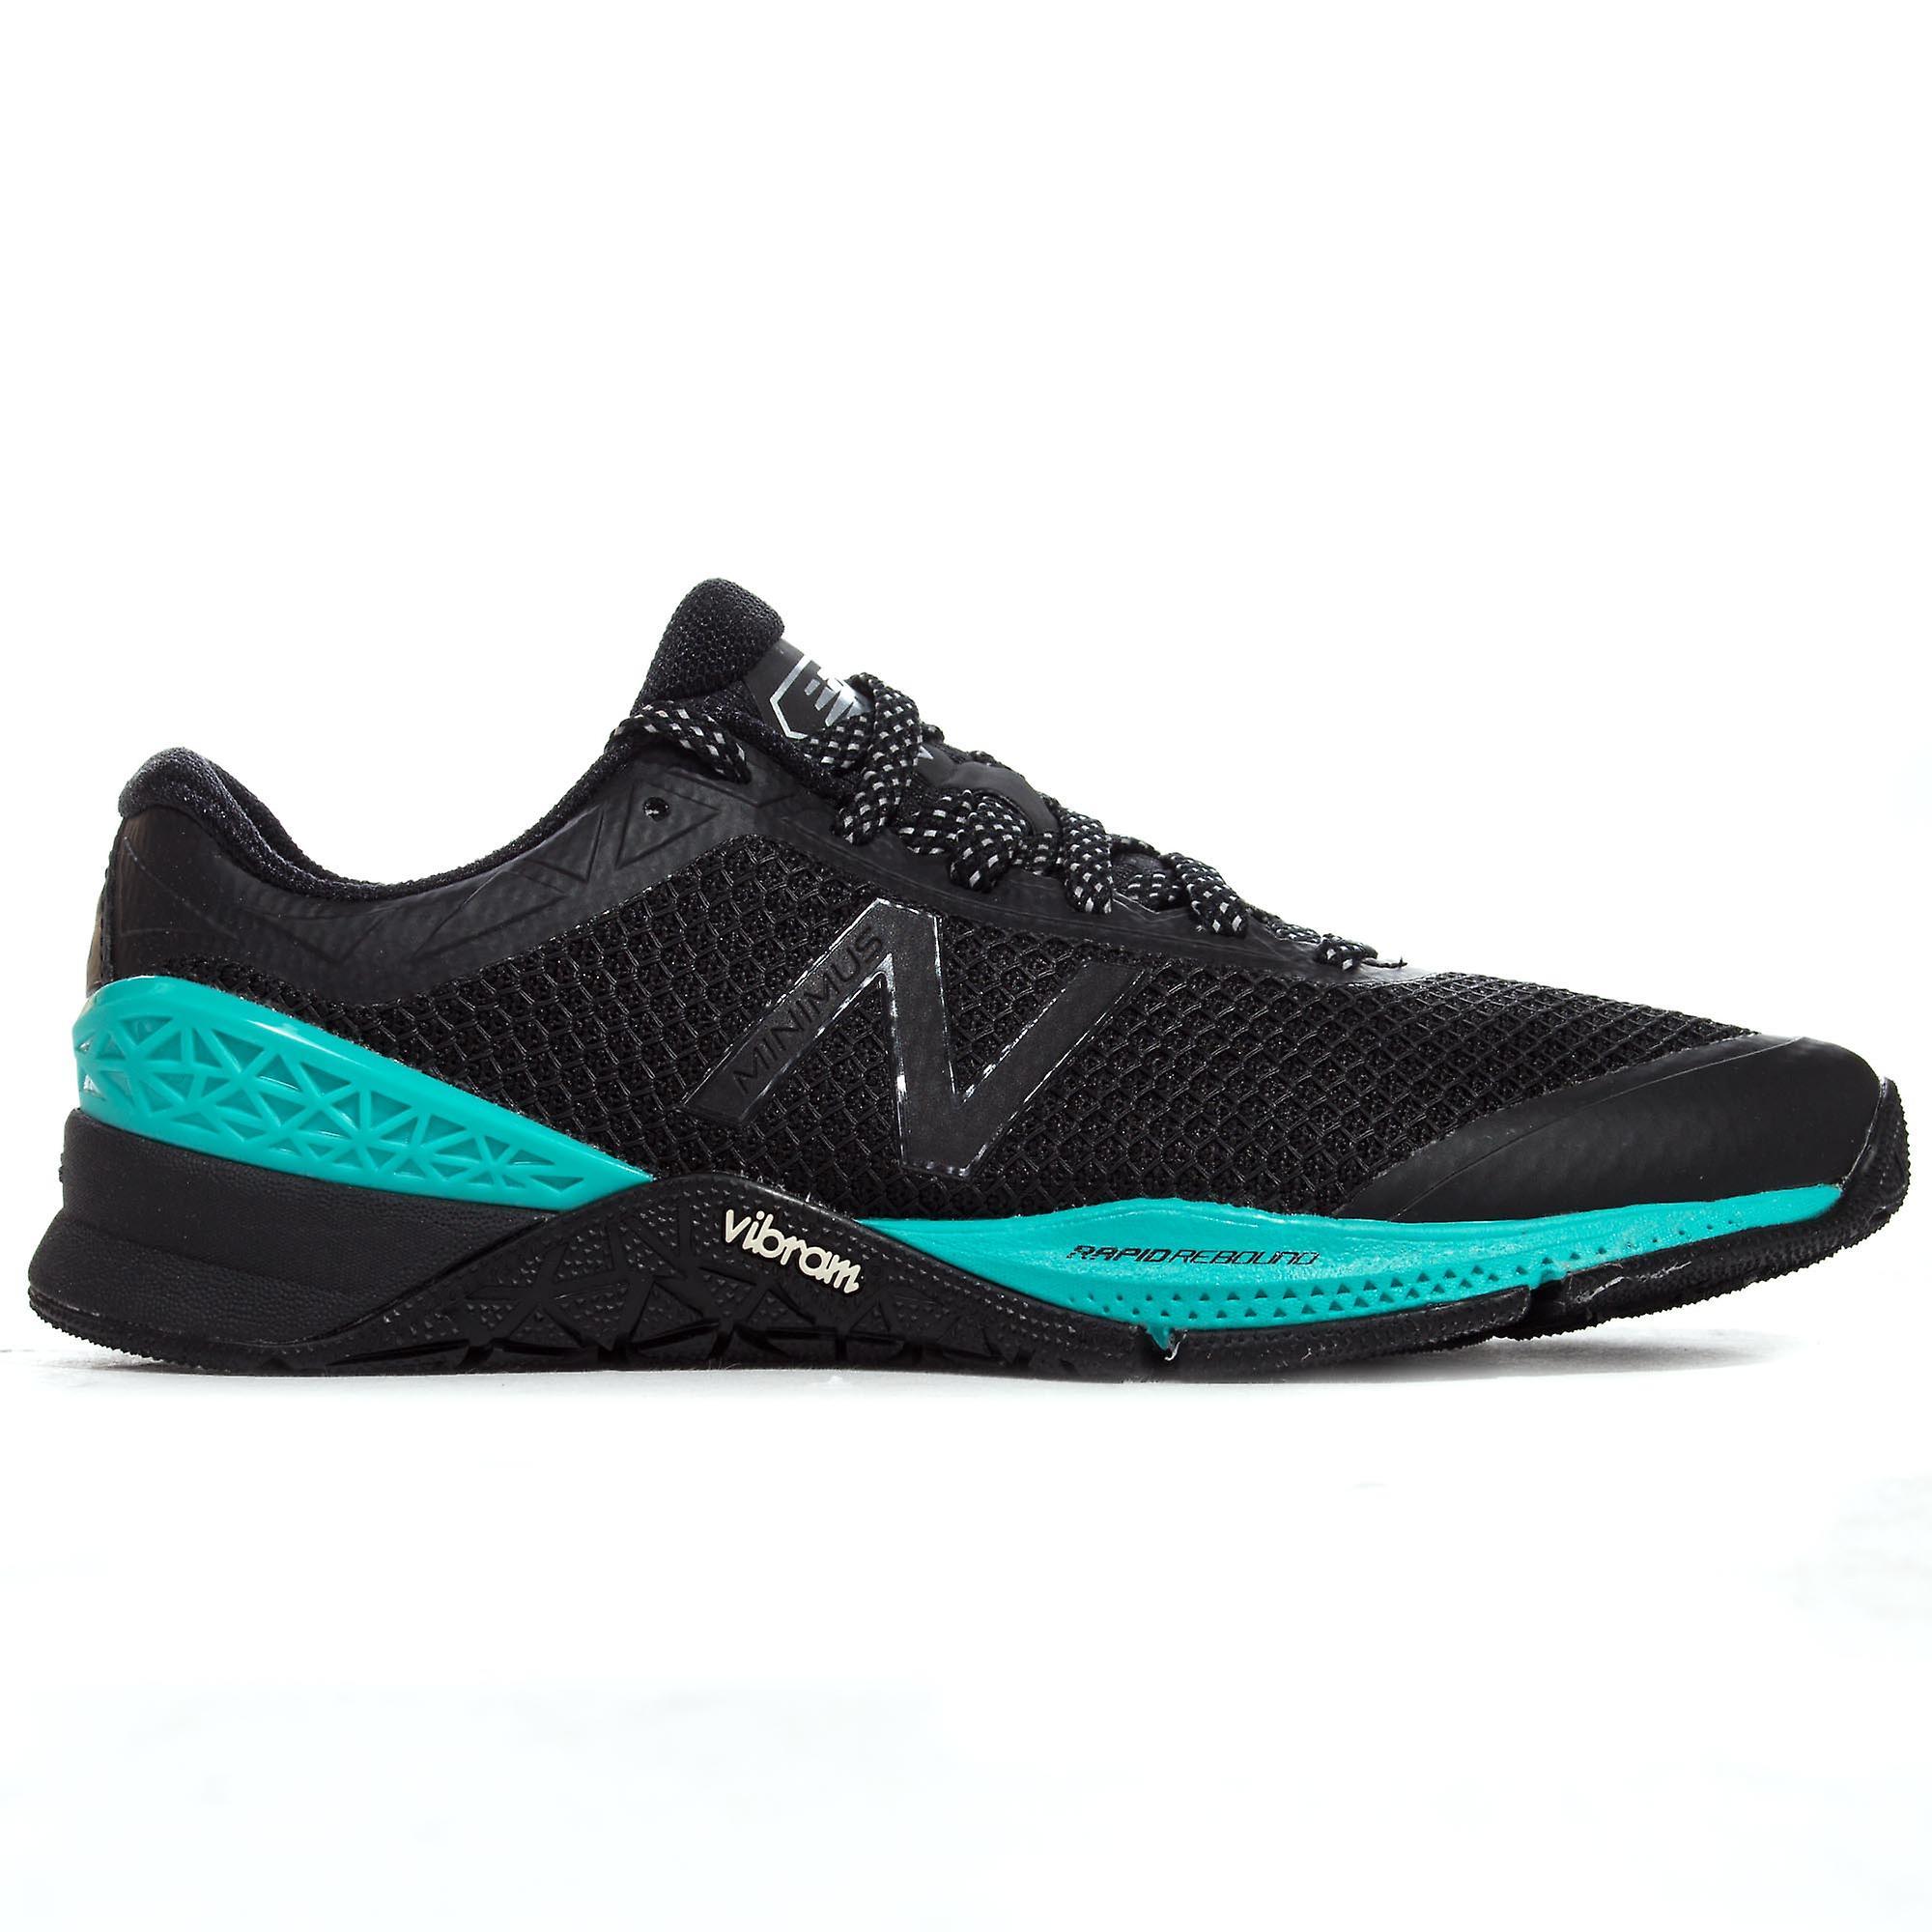 New Balance Minimus 40 Womens Training Fitness Trainer Shoe Black/Blue